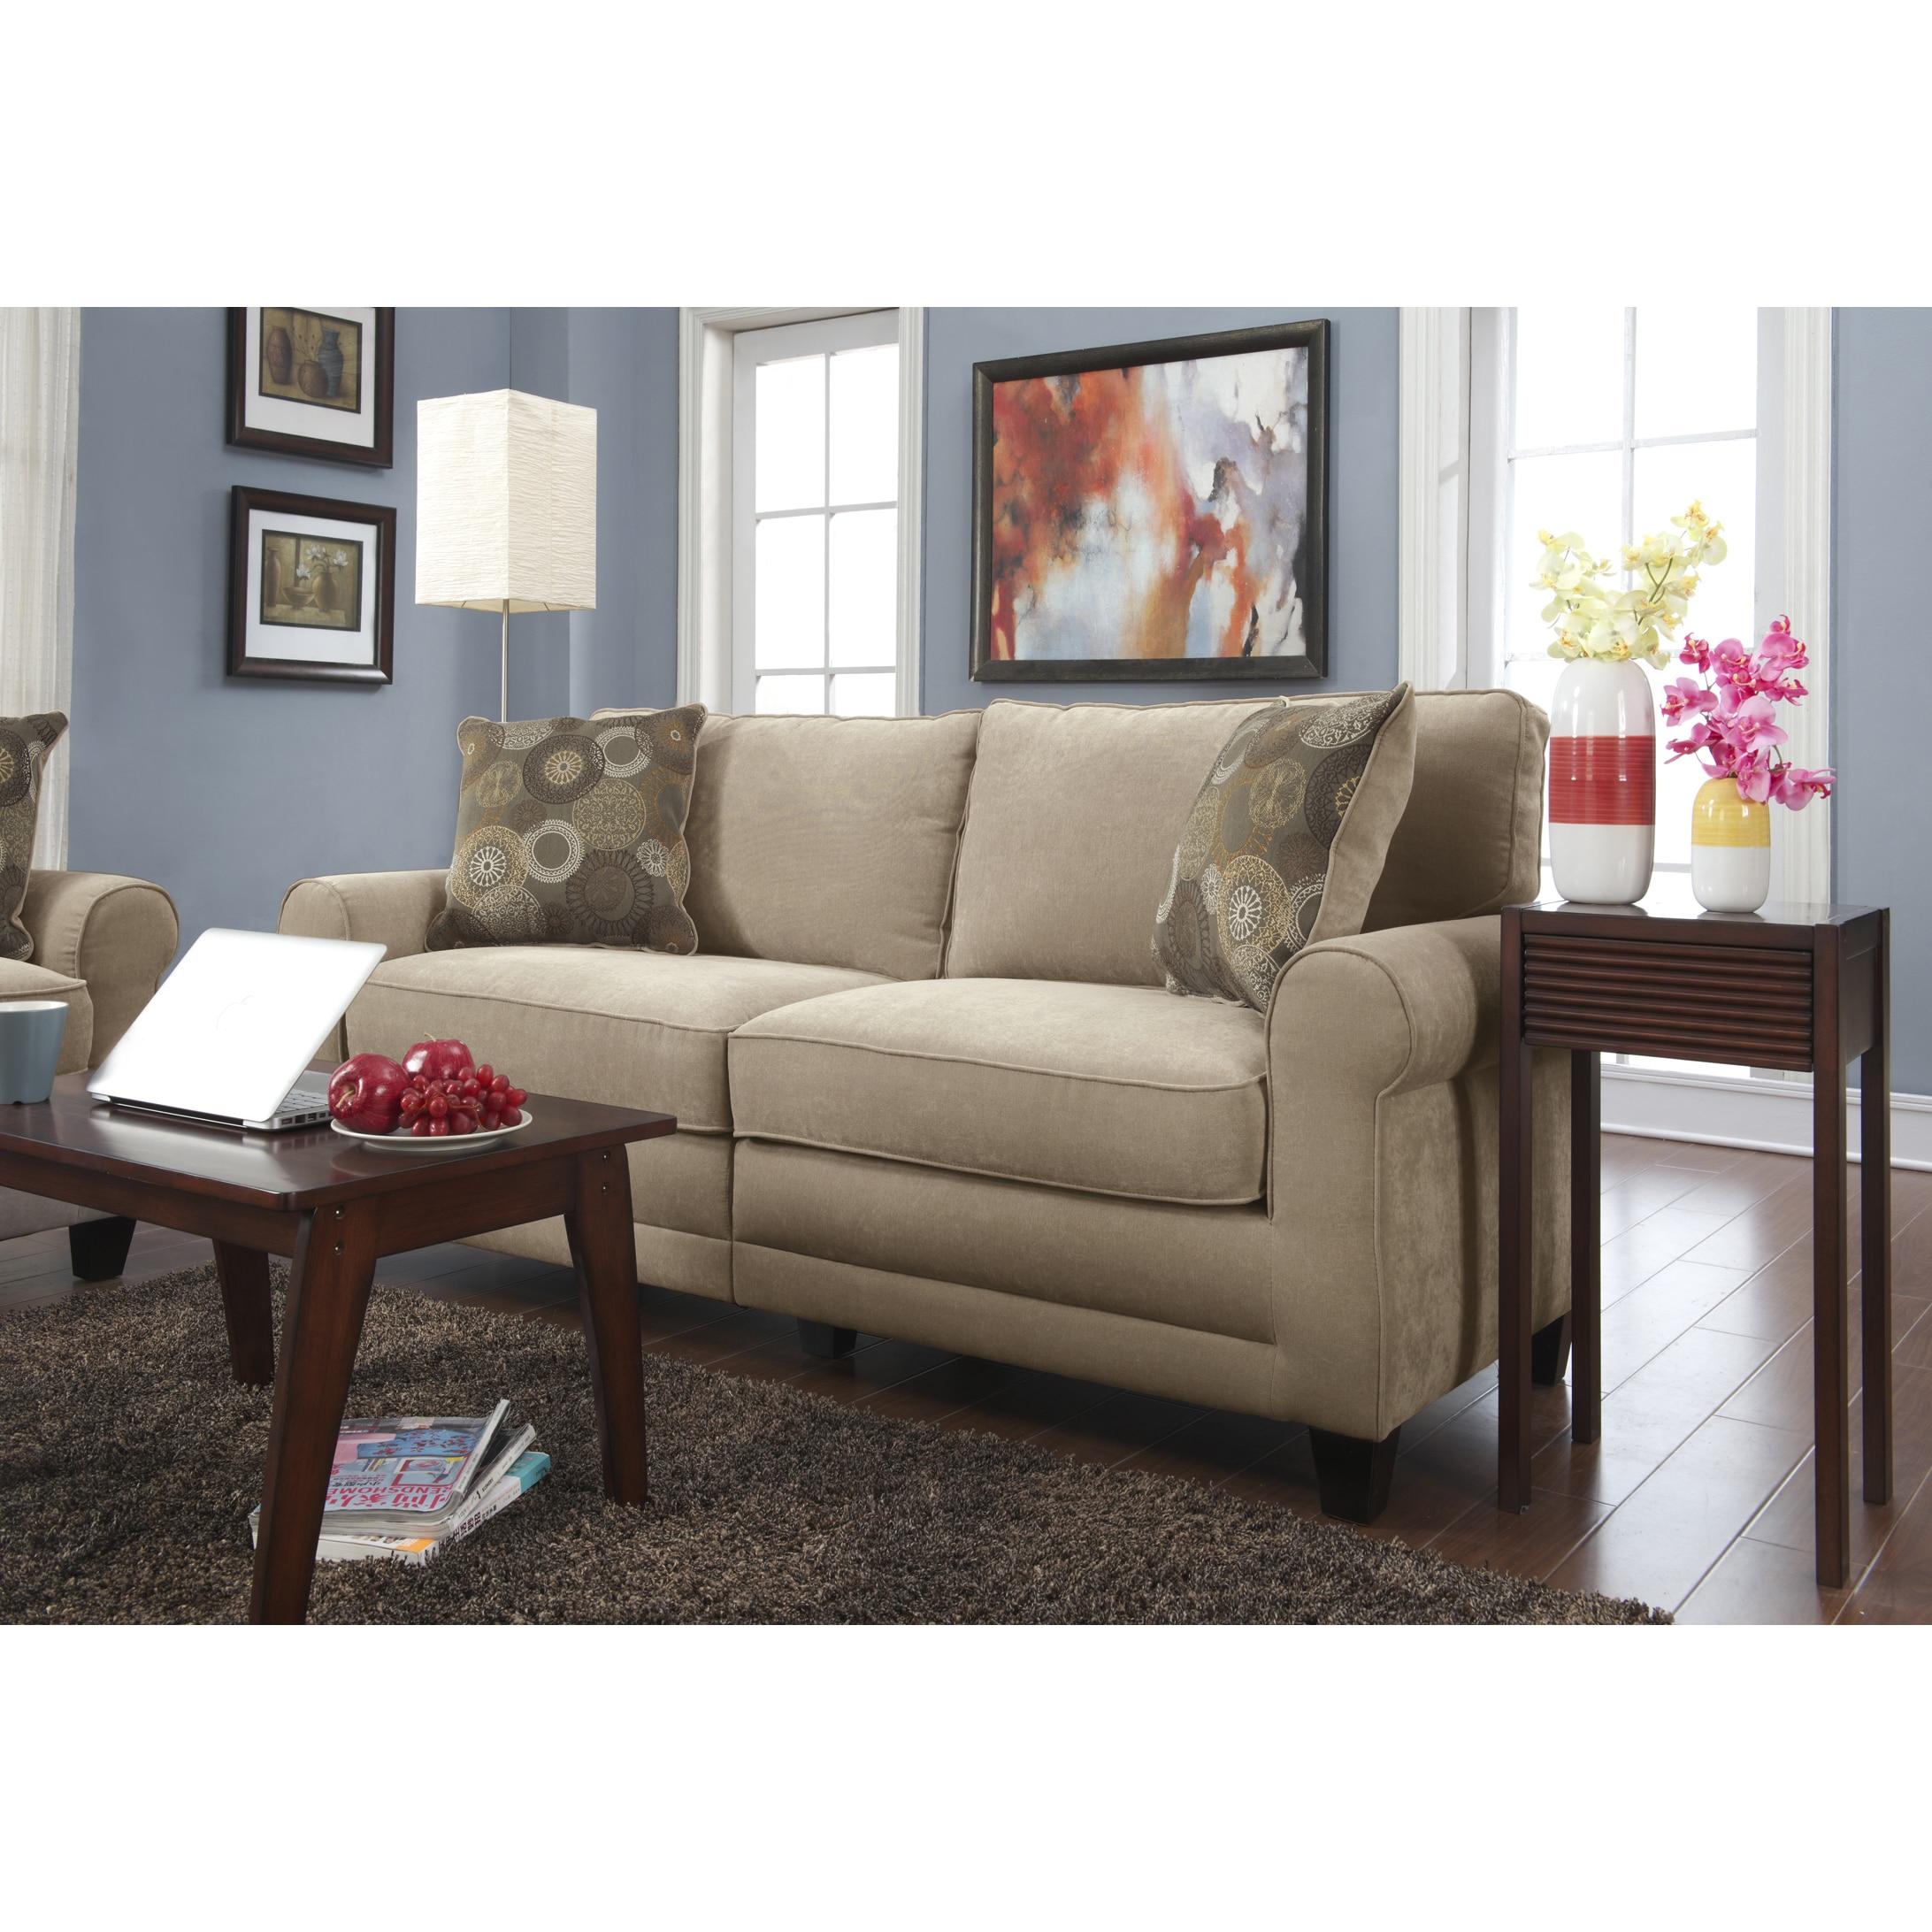 martin pdx serta barrel furniture upholstery studio modern sleeper sofa red couch reviews house wayfair